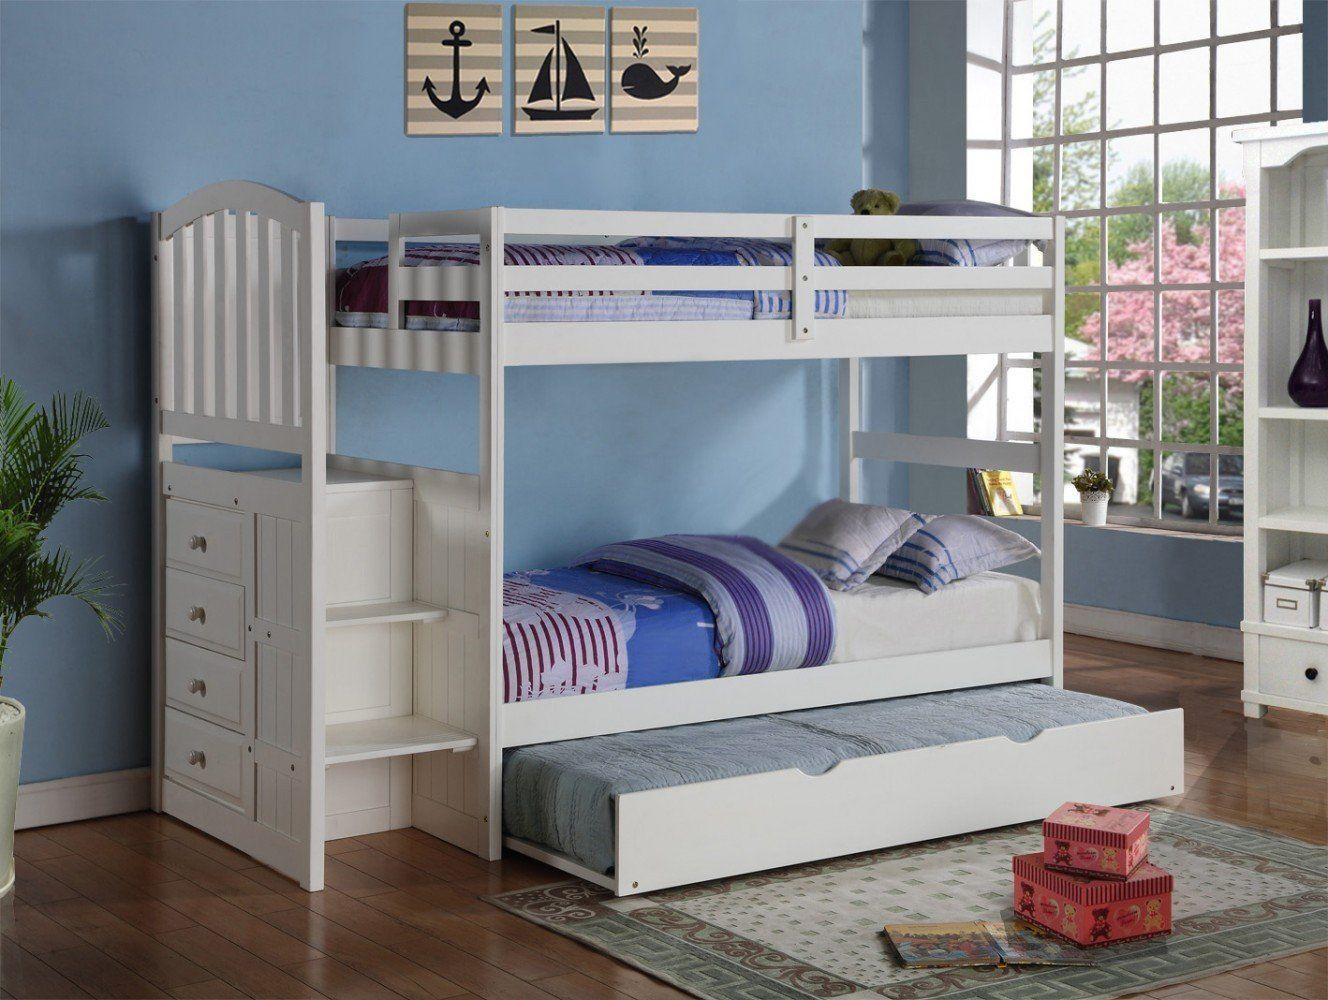 sadie white bunk bed bunk bed dresser bookshelf and toddler bunk beds